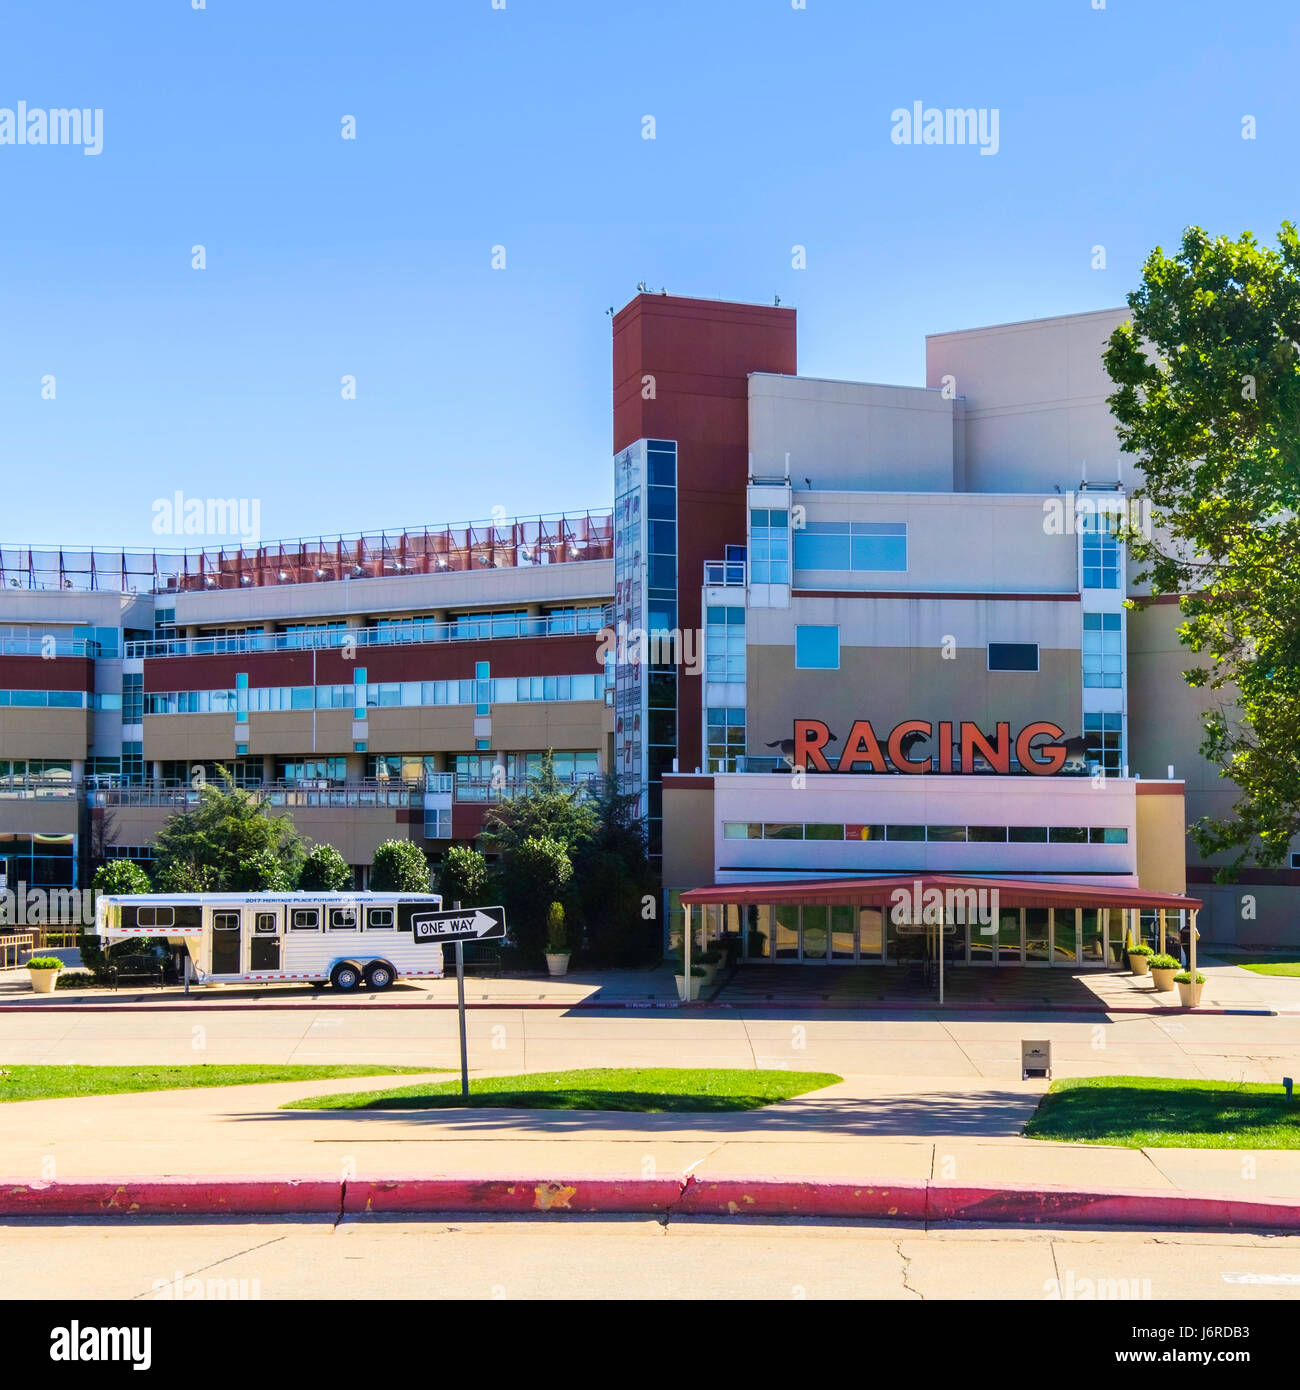 The entrance to Remington Park horse racing track in Oklahoma City, Oklahoma, USA. - Stock Image